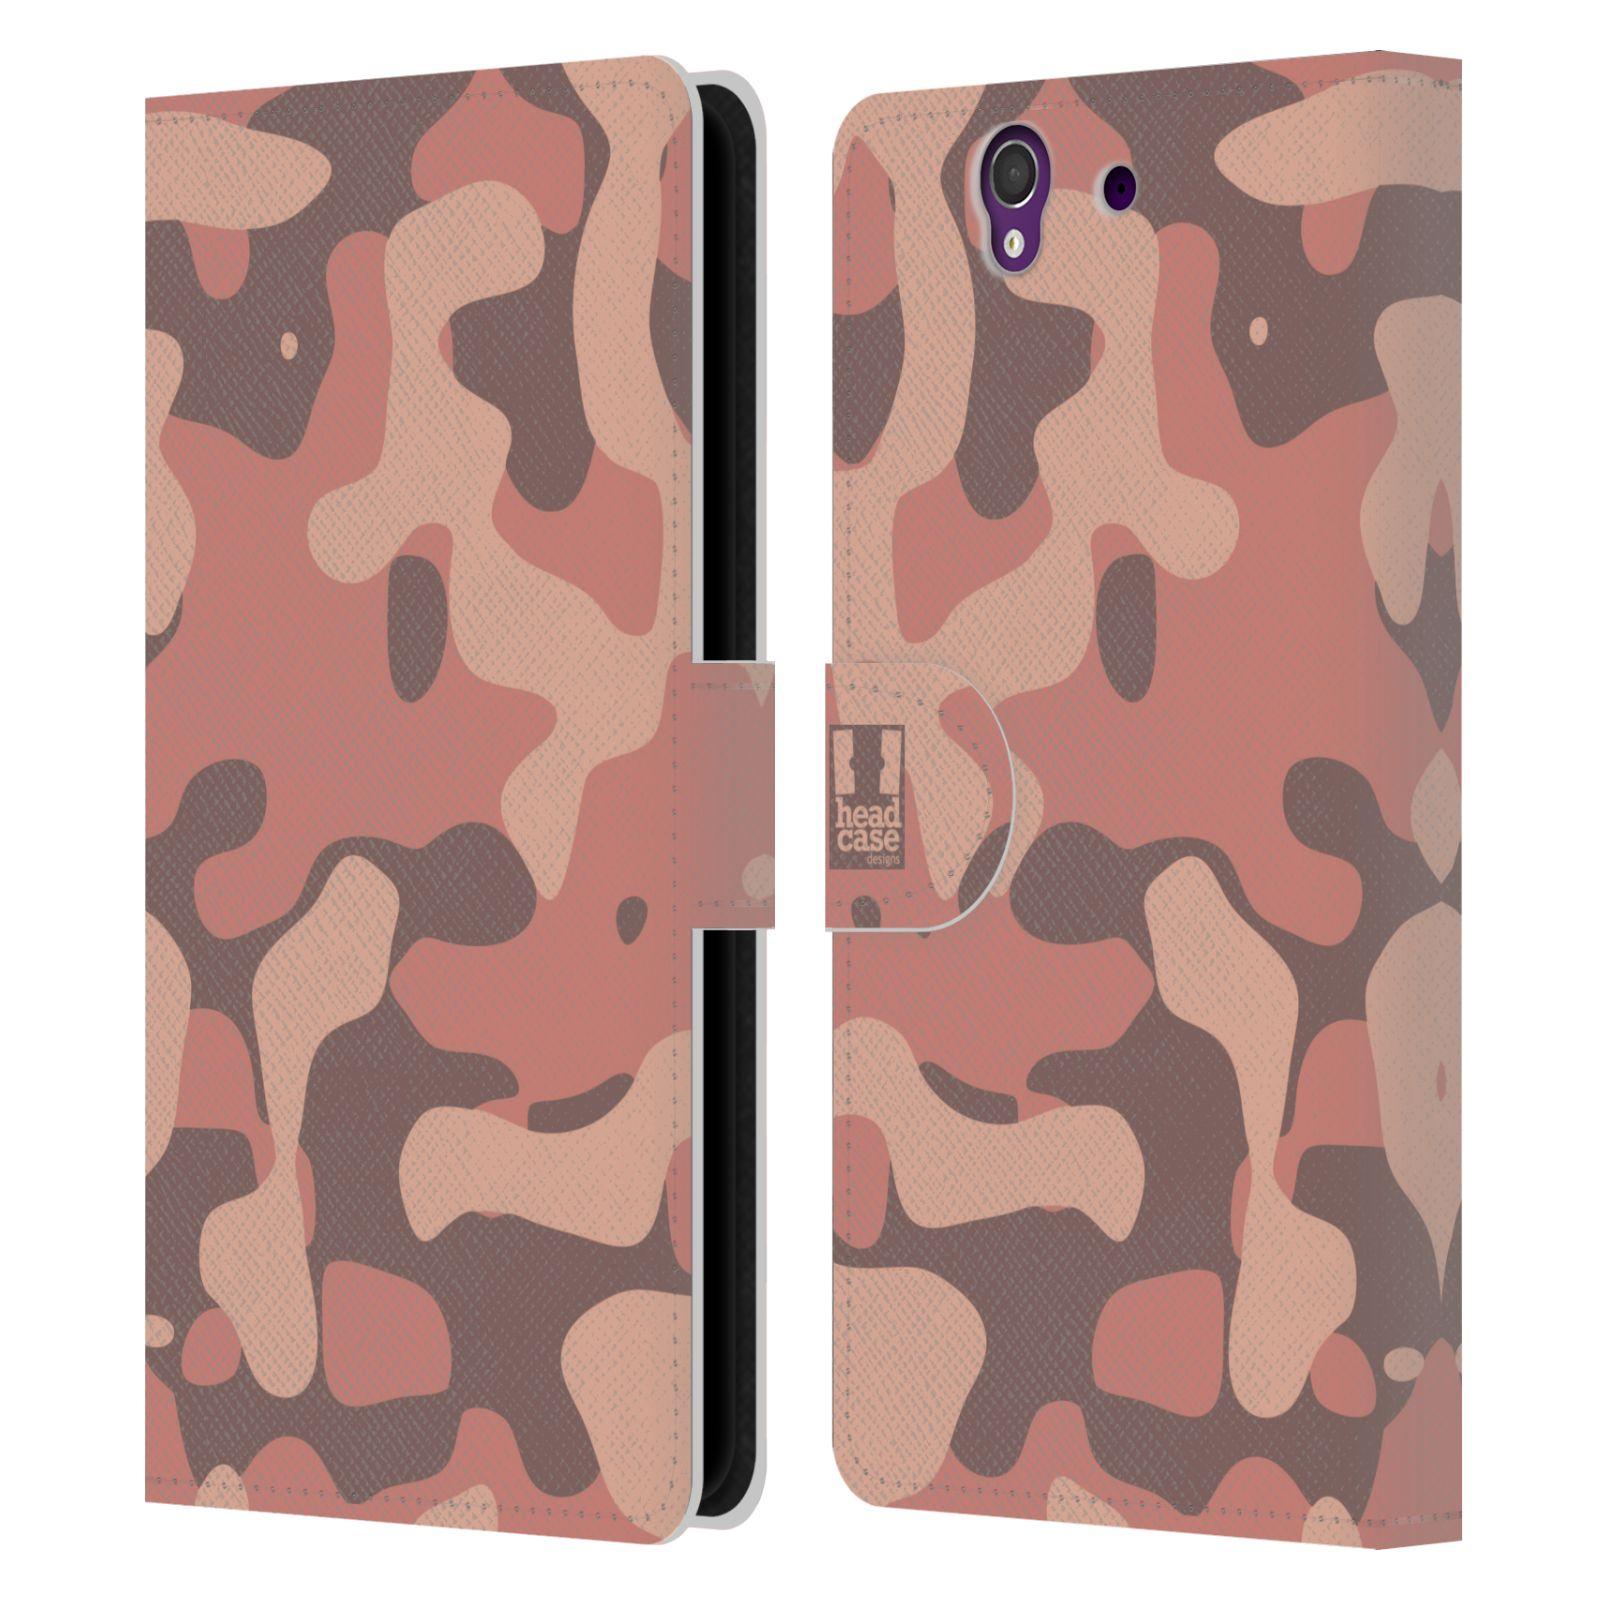 HEAD CASE Flipové pouzdro pro mobil SONY XPERIA Z (C6603) lehká barevná kamufláž růžová, losos